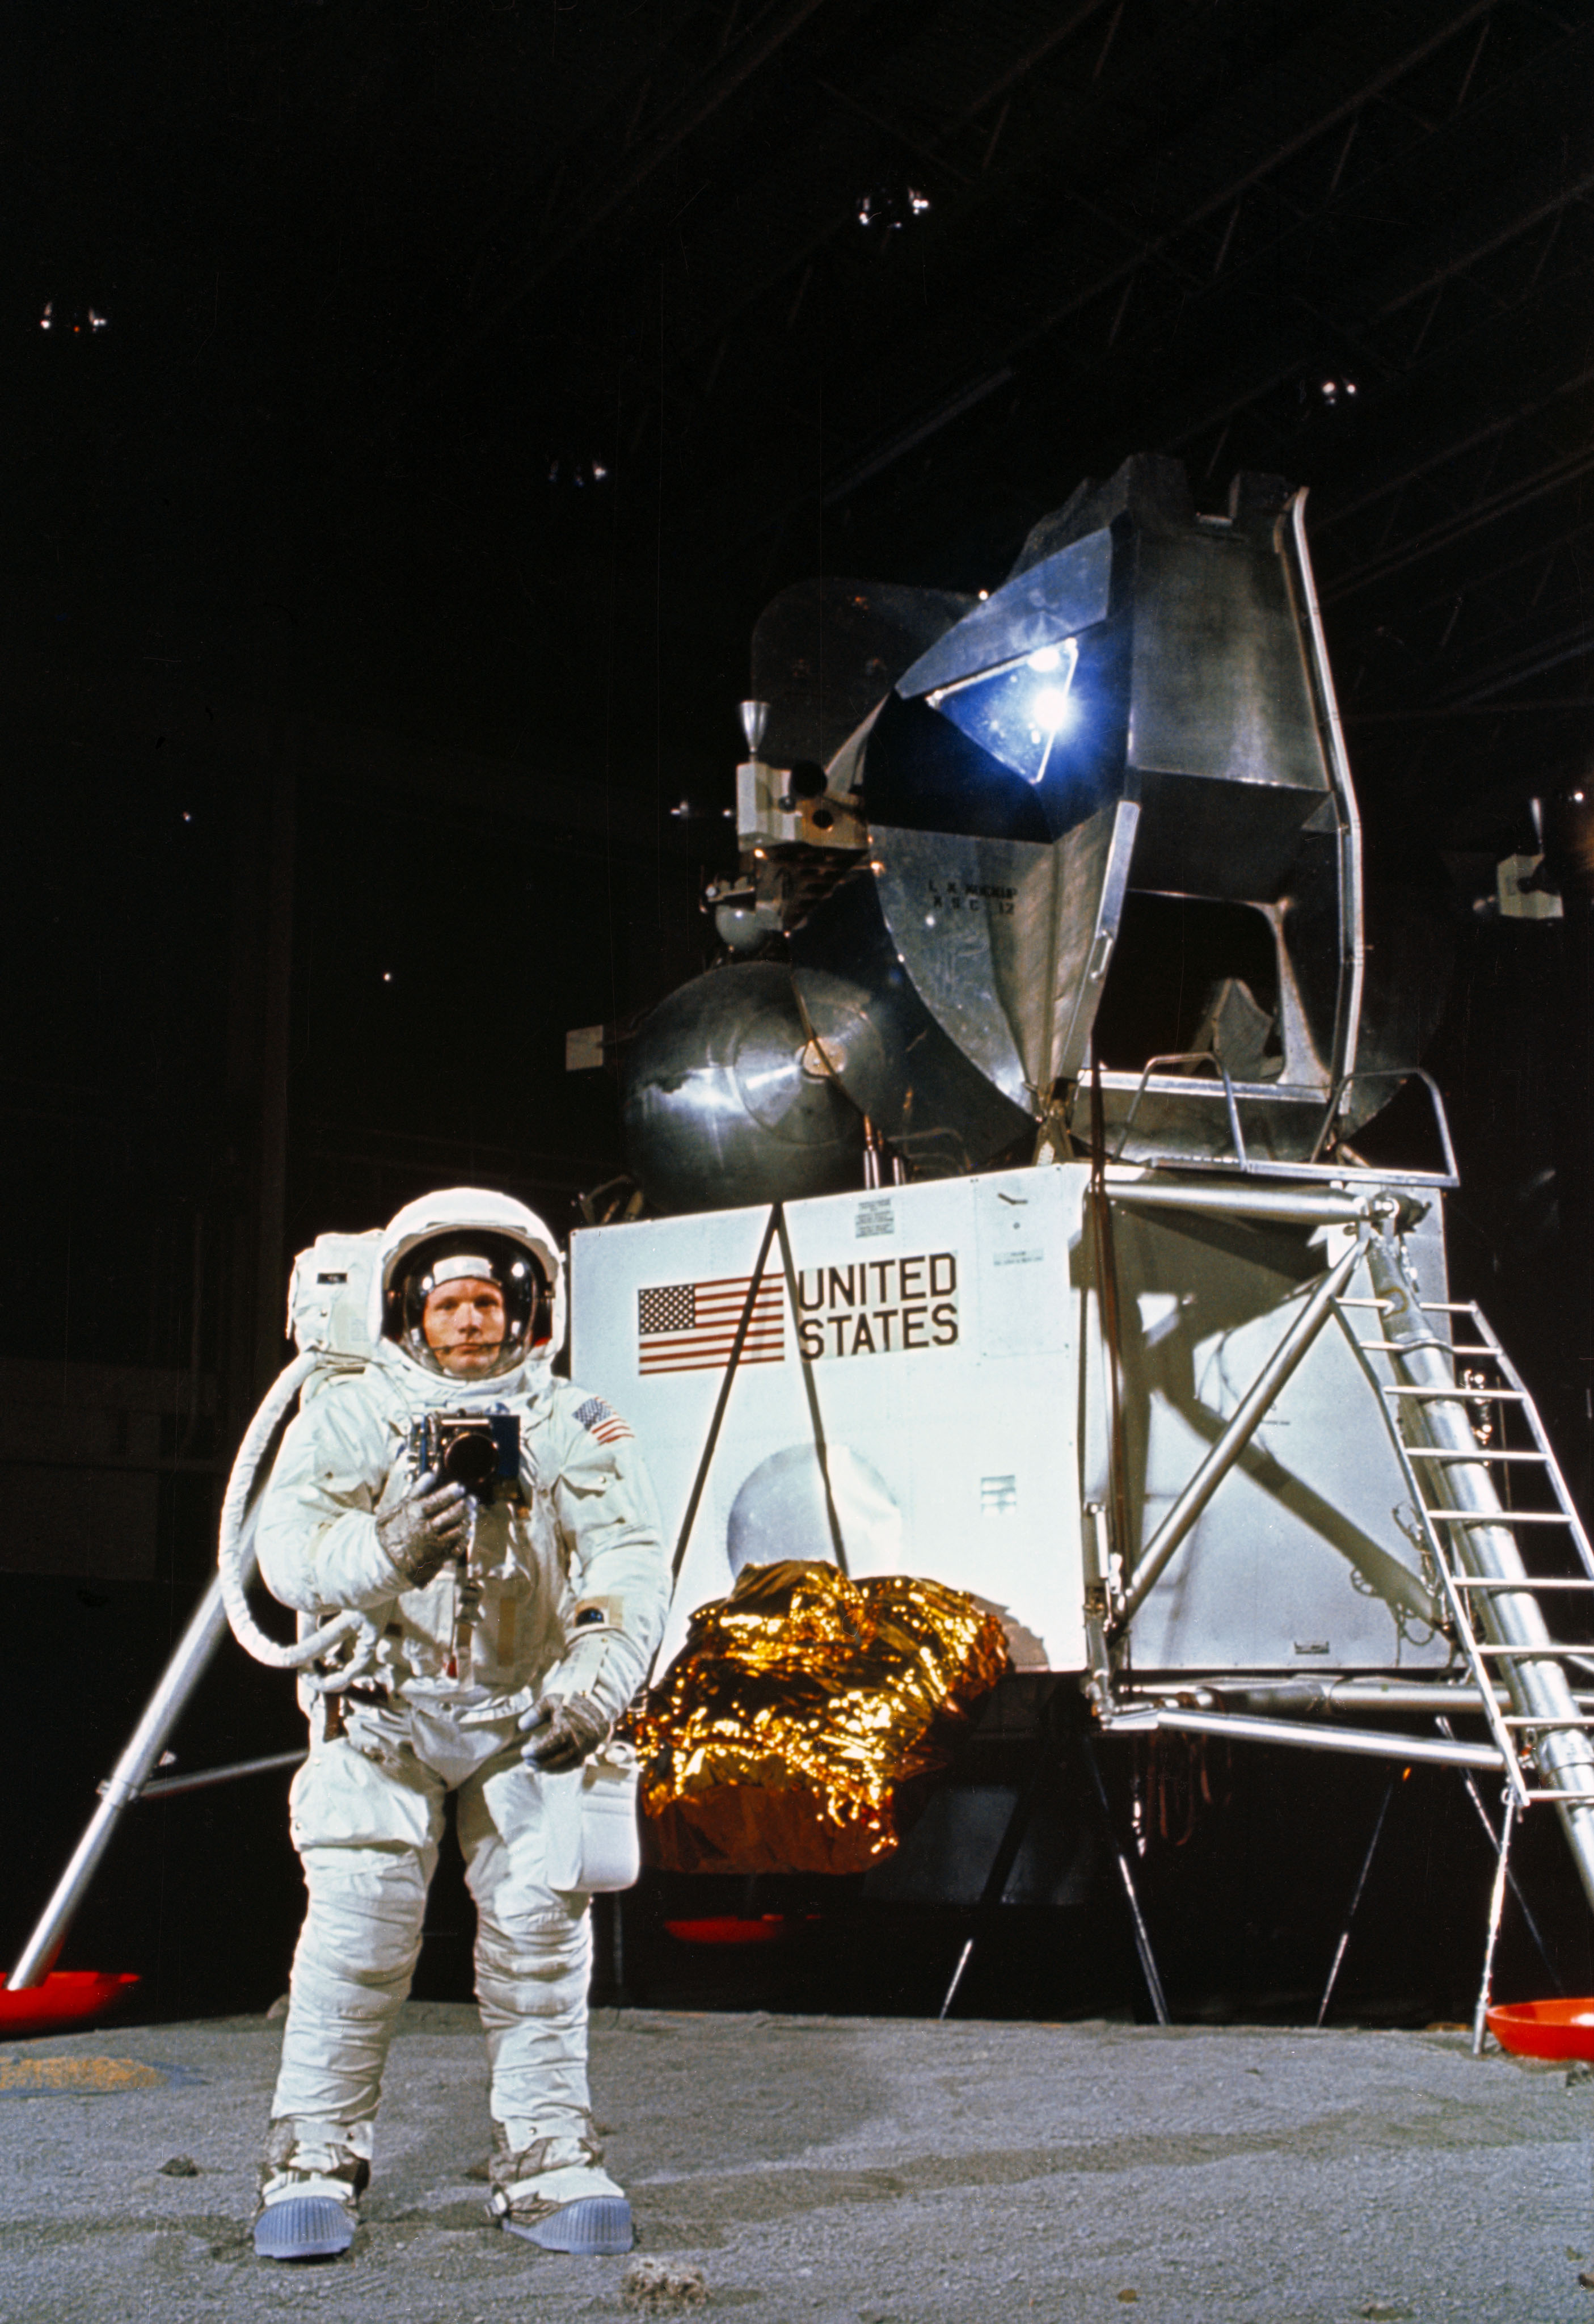 Apollo 11 Moonwalk Training: Neil Armstrong